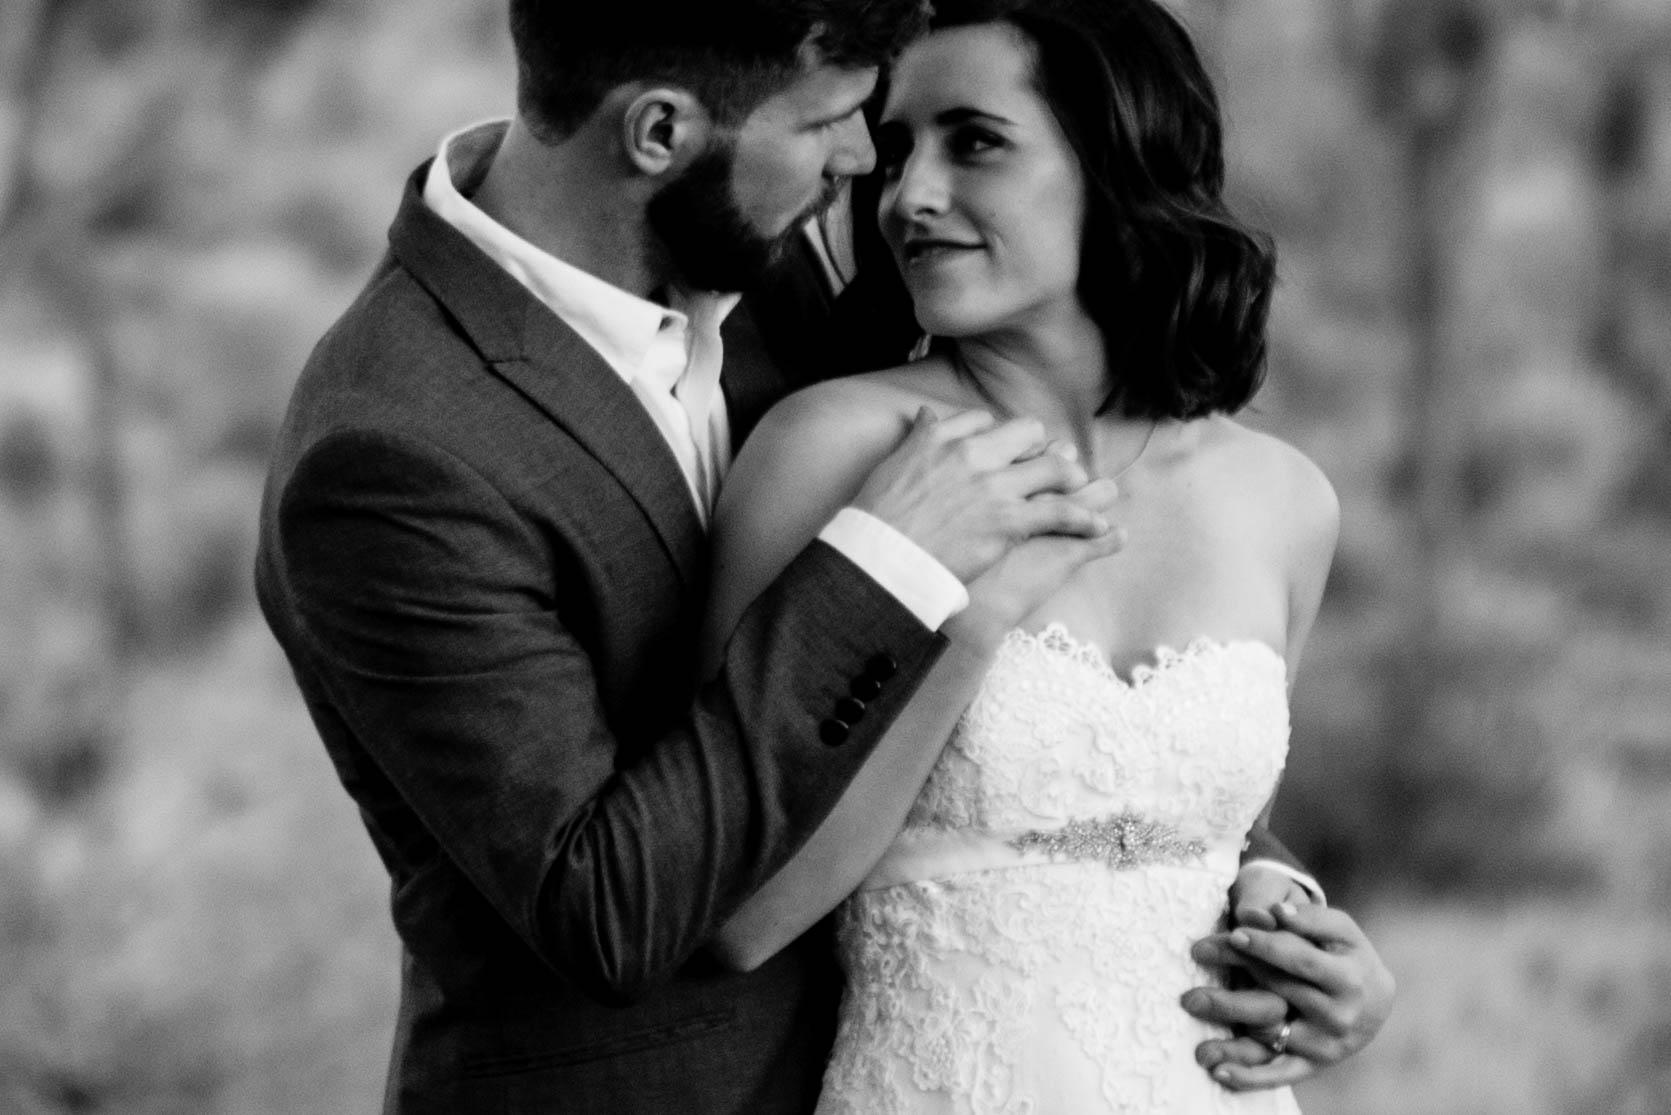 nicole-daacke-photography-joshua-tree-adventurous-elopement-wedding-national-park-wedding-photographer-adventure-wedding-adventurous-elopement-jtree-joshua-tree-national-park-wedding-photographer-intimate-weddings-golden-desert-love-38.jpg